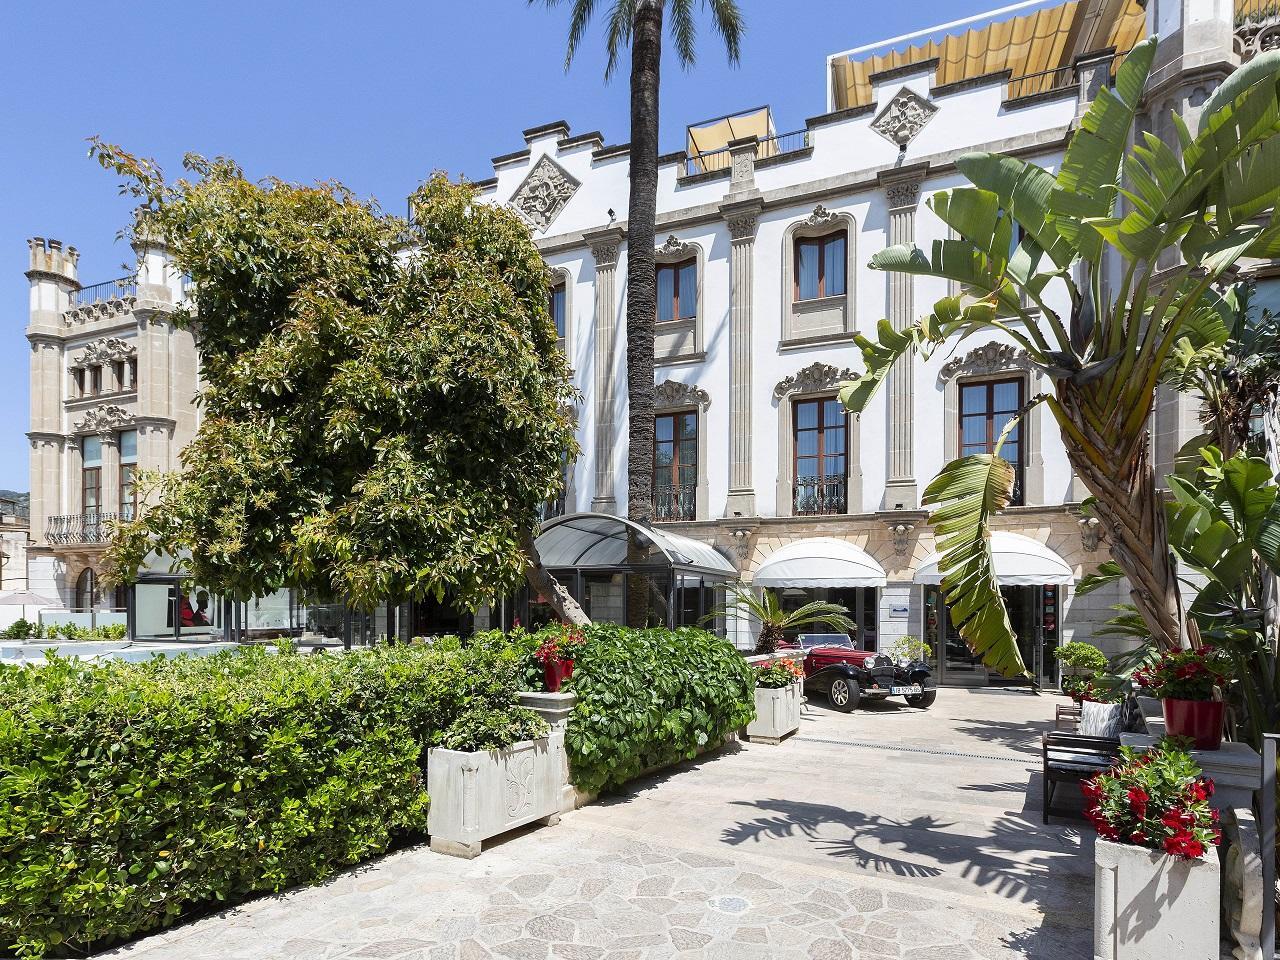 Private parking at Gran Hotel Sóller in Sóller, Majorca